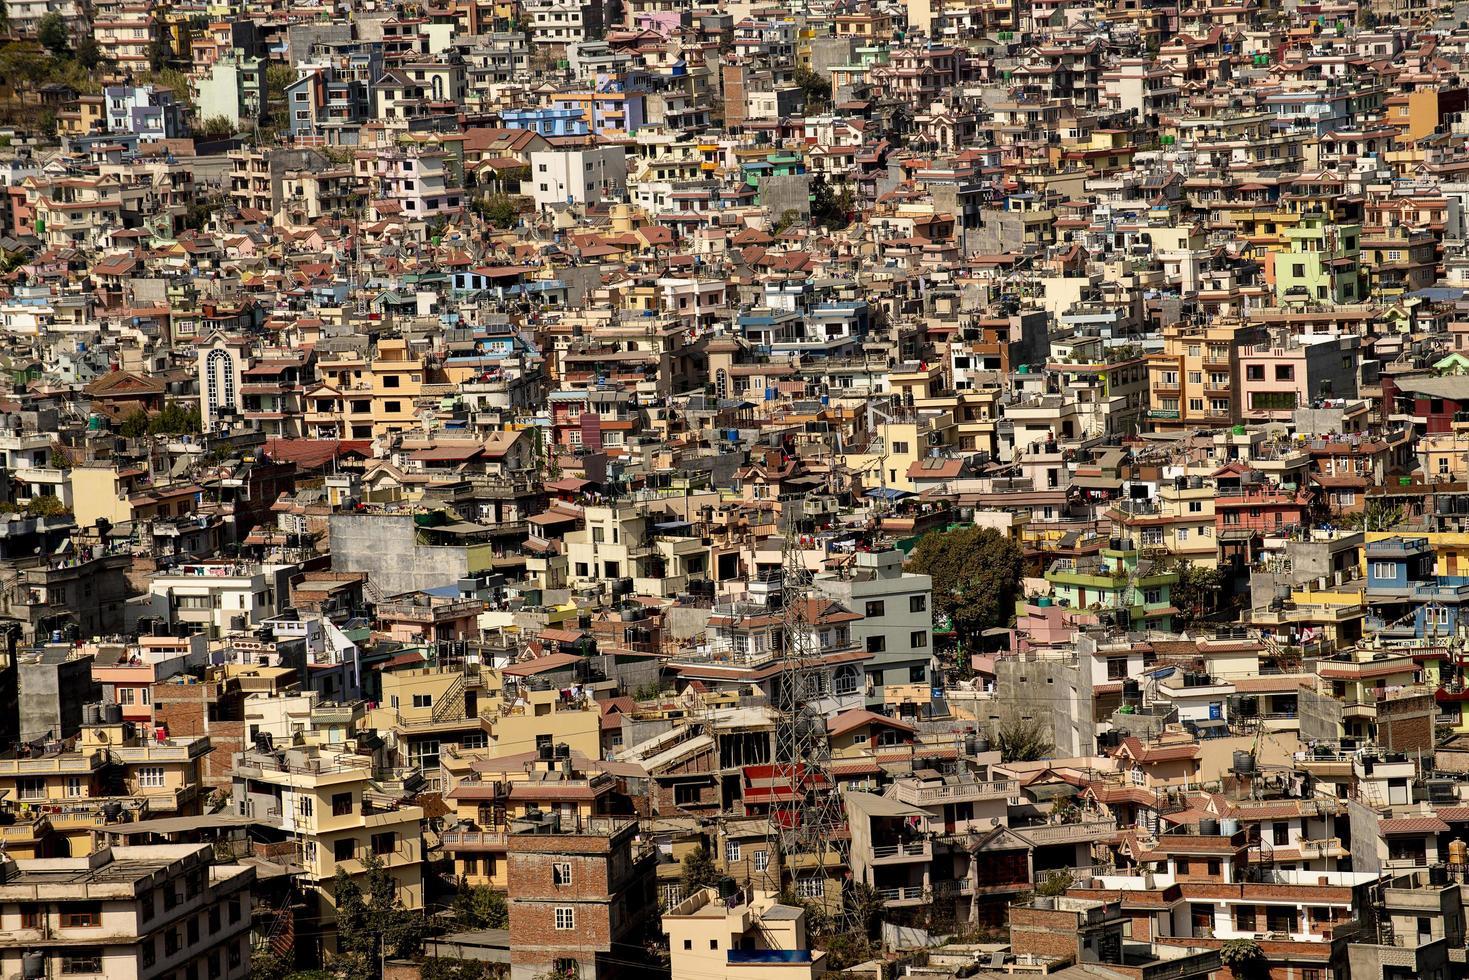 Crowded city scene photo